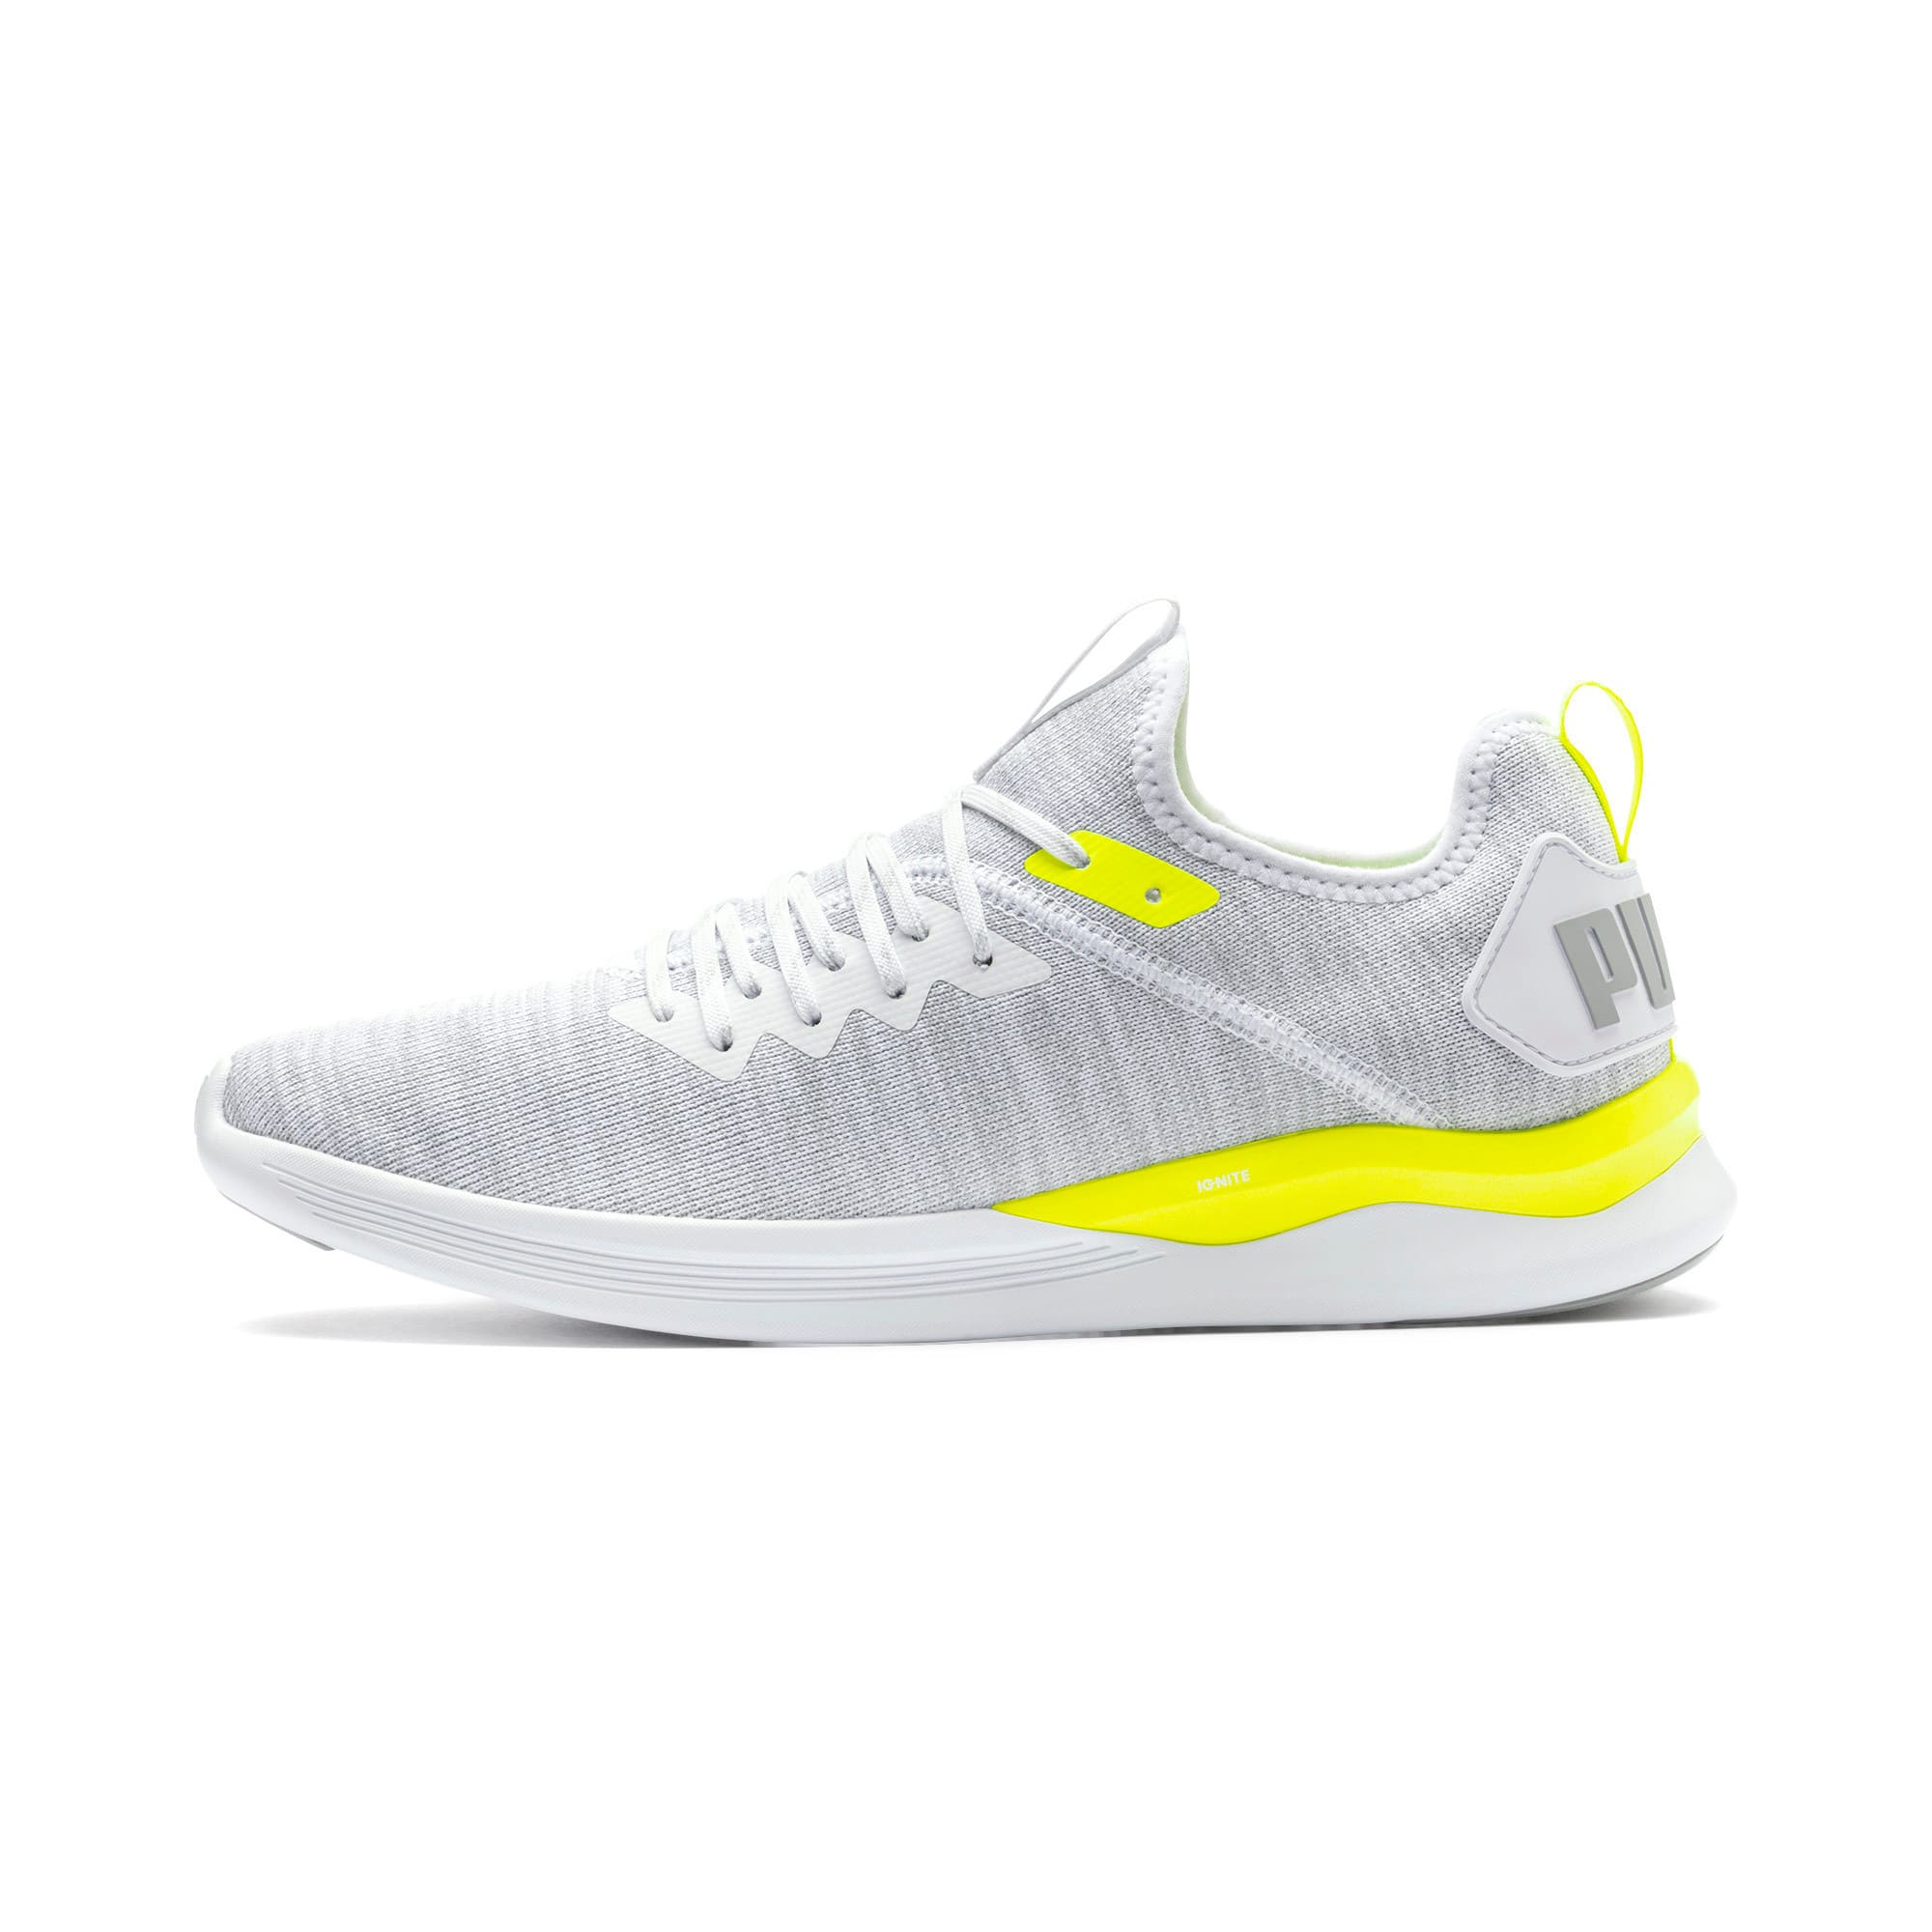 Thumbnail 1 of IGNITE Flash evoKNIT Men's Training Shoes, White-High Rise-Yellow Alert, medium-IND